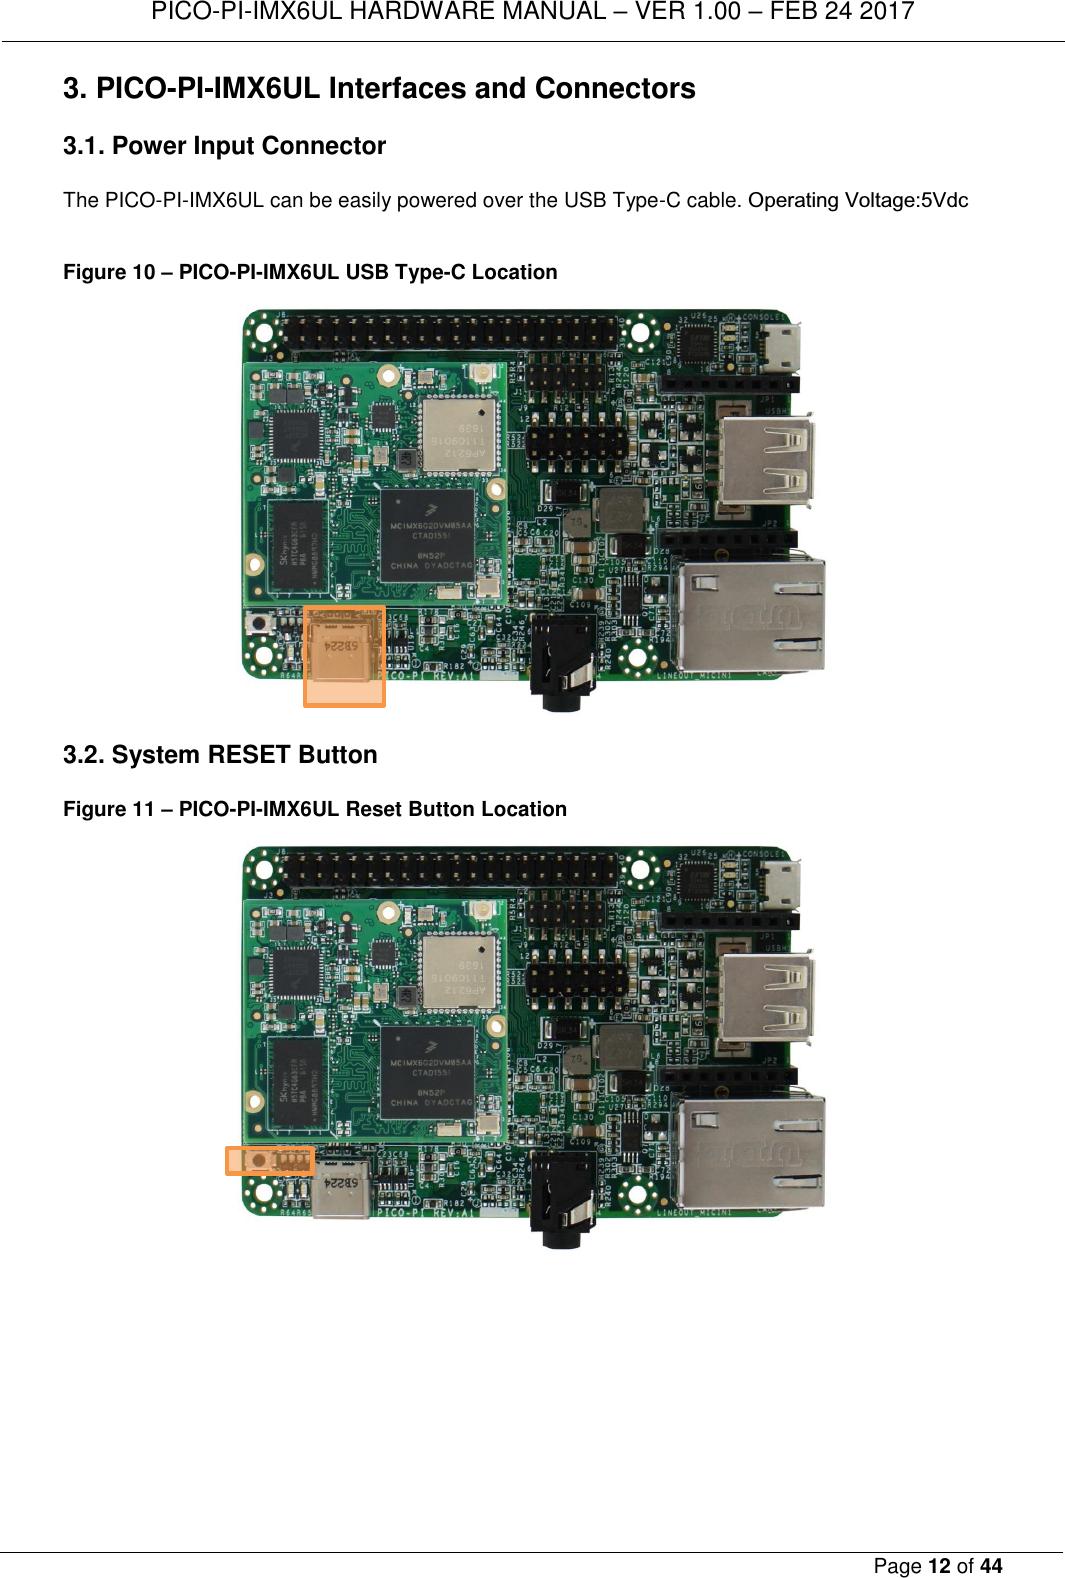 TECHNEXION PICOIMX6 WiFi+Bluetooth 4 0(HS) System on Module User Manual